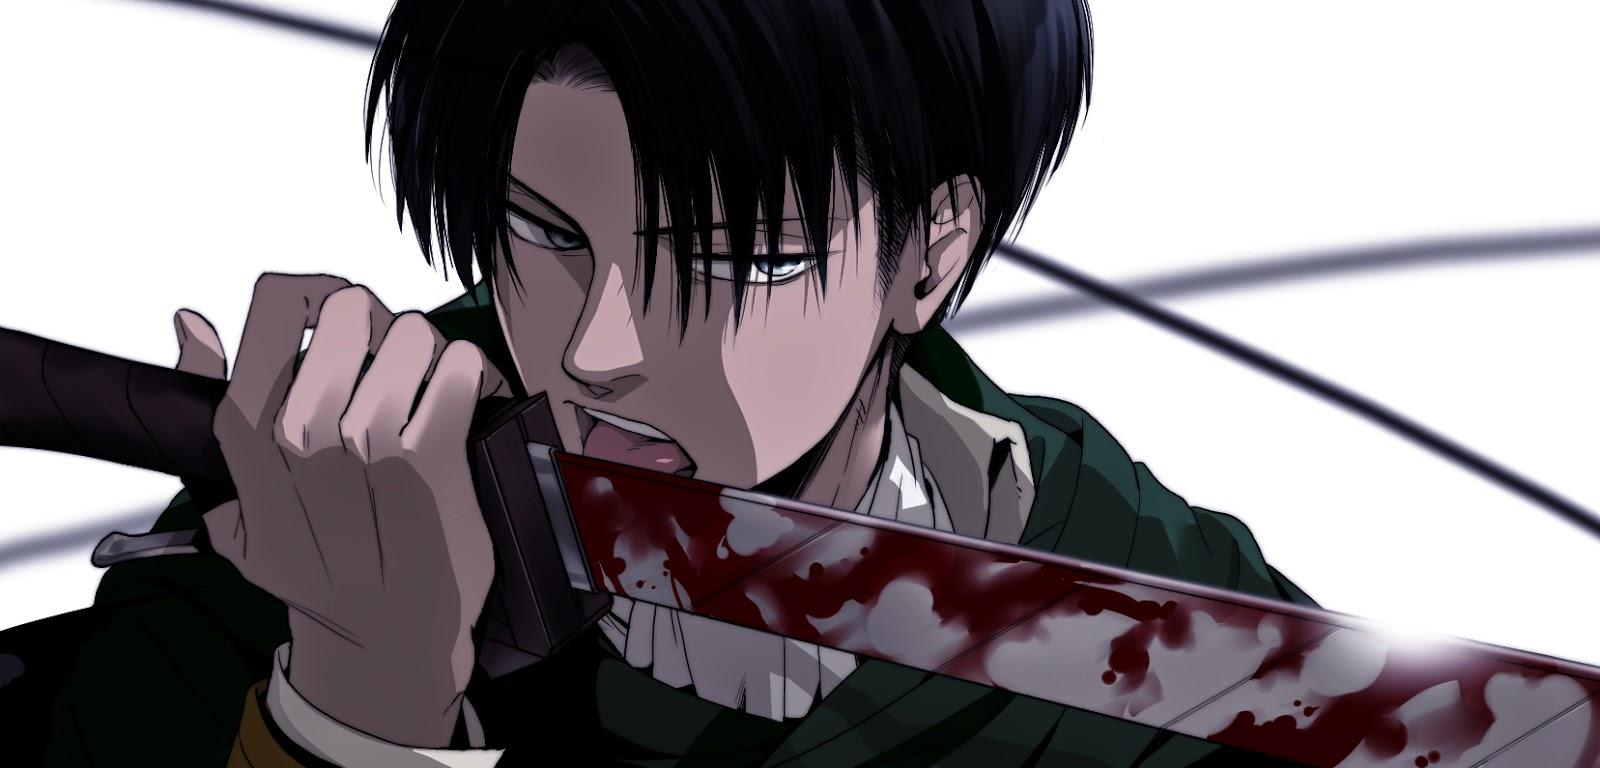 Umur Levi (Shingeki No Kyojin) ternyata sudah diatas 30 tahun